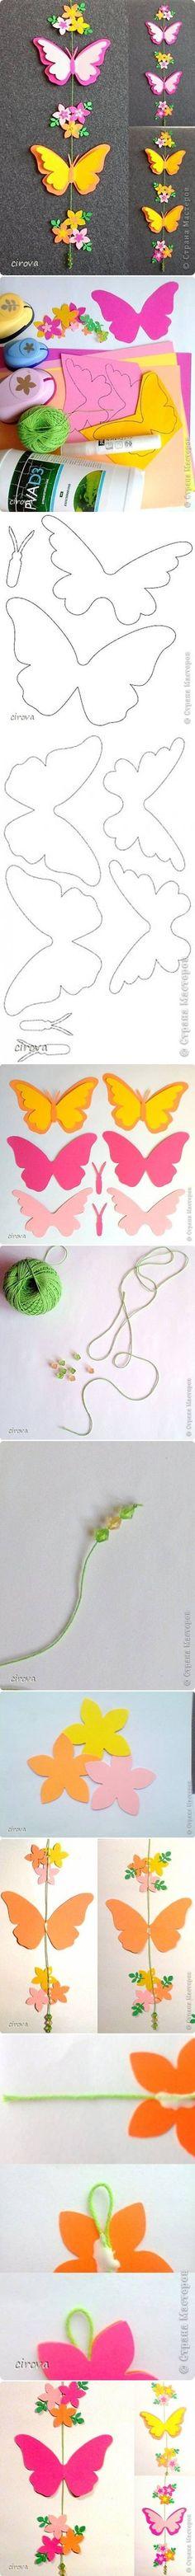 8 Hobbies & Crafts Pins trending this week - deepshikhad11@gmail.com - Gmail